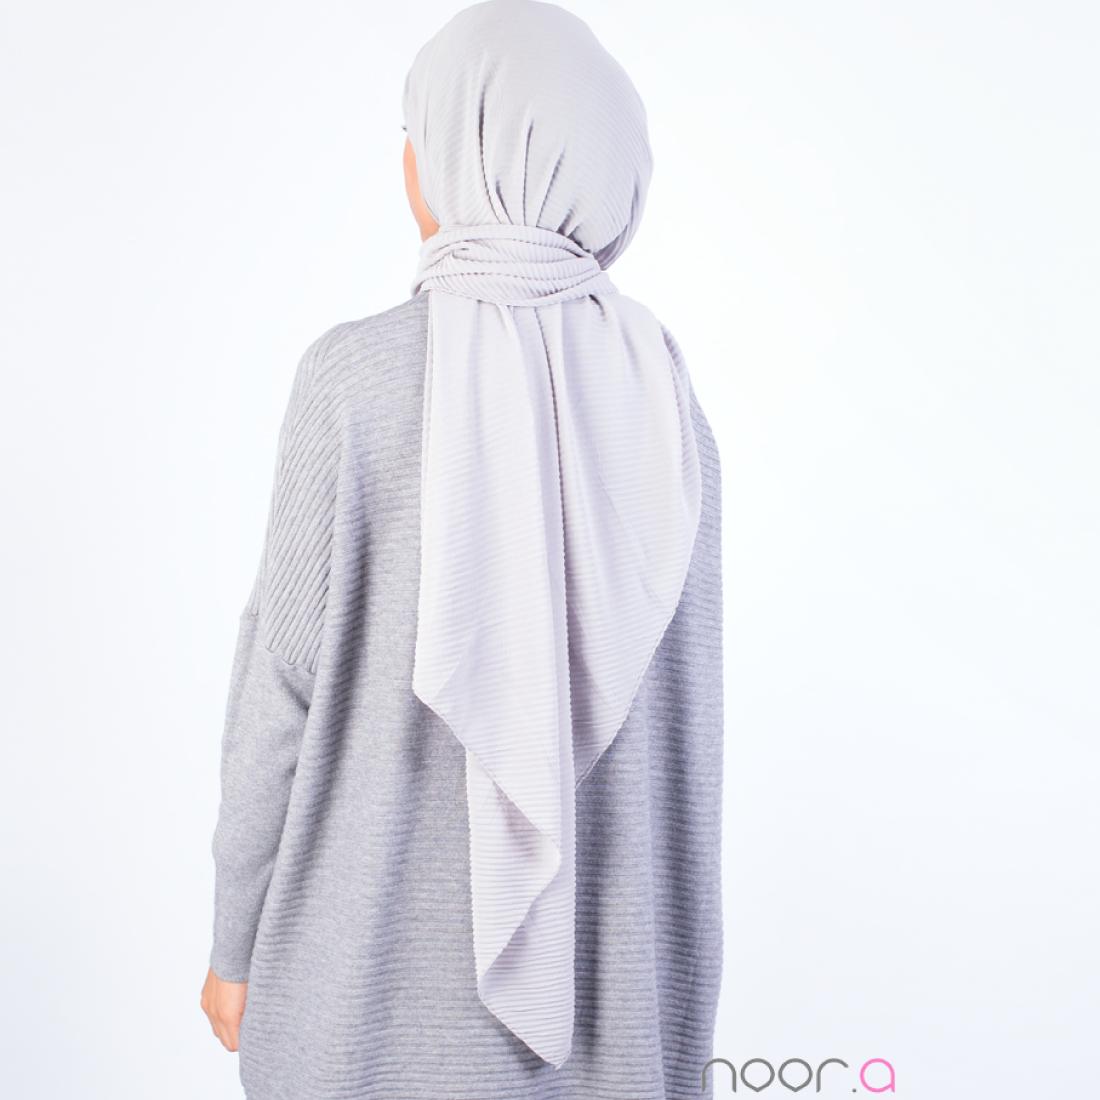 hijab_plisse_gris1